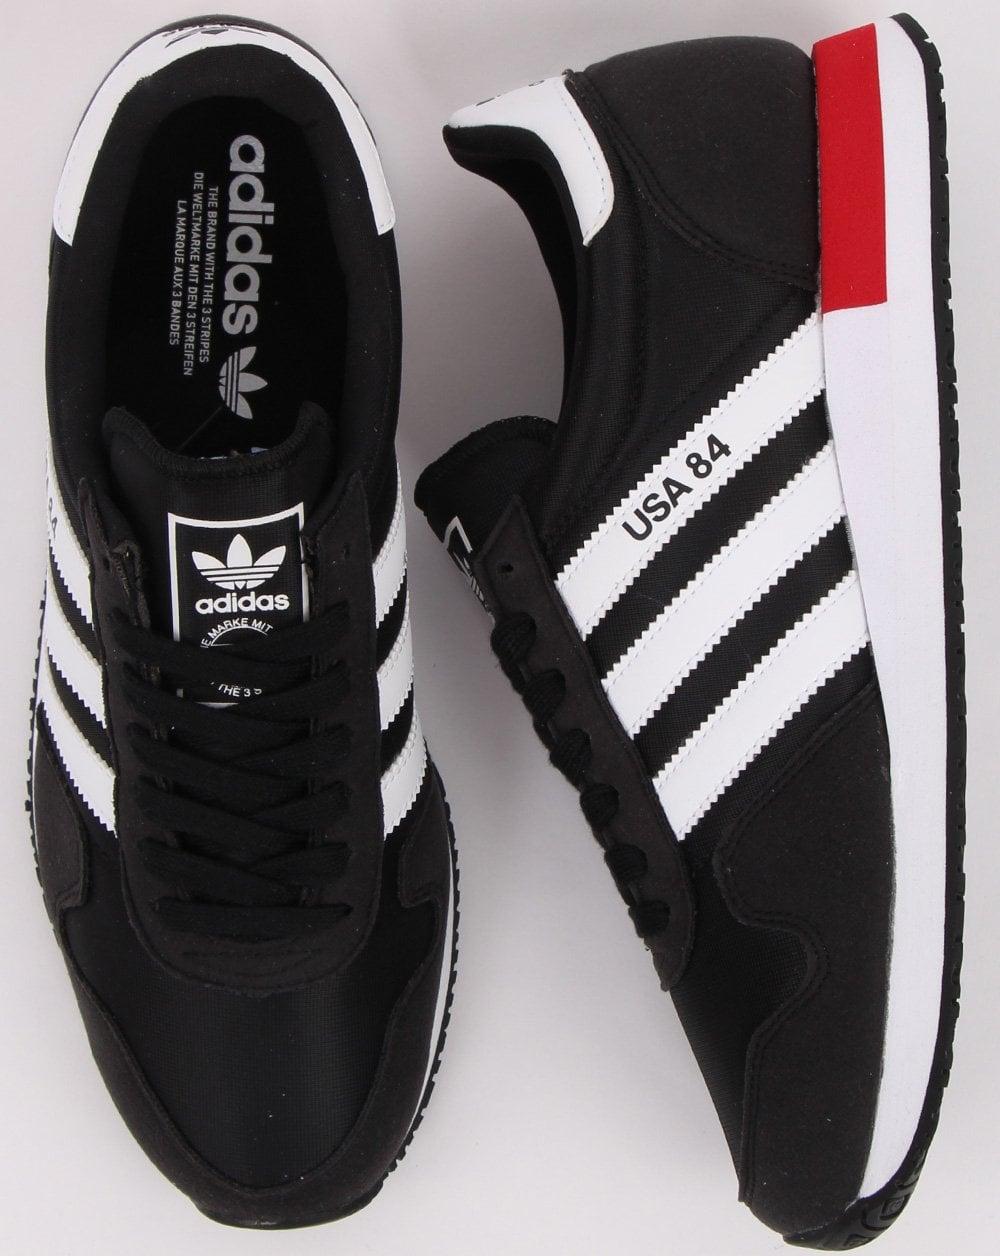 Adidas Usa 84 Trainers Black/White/Scarlet